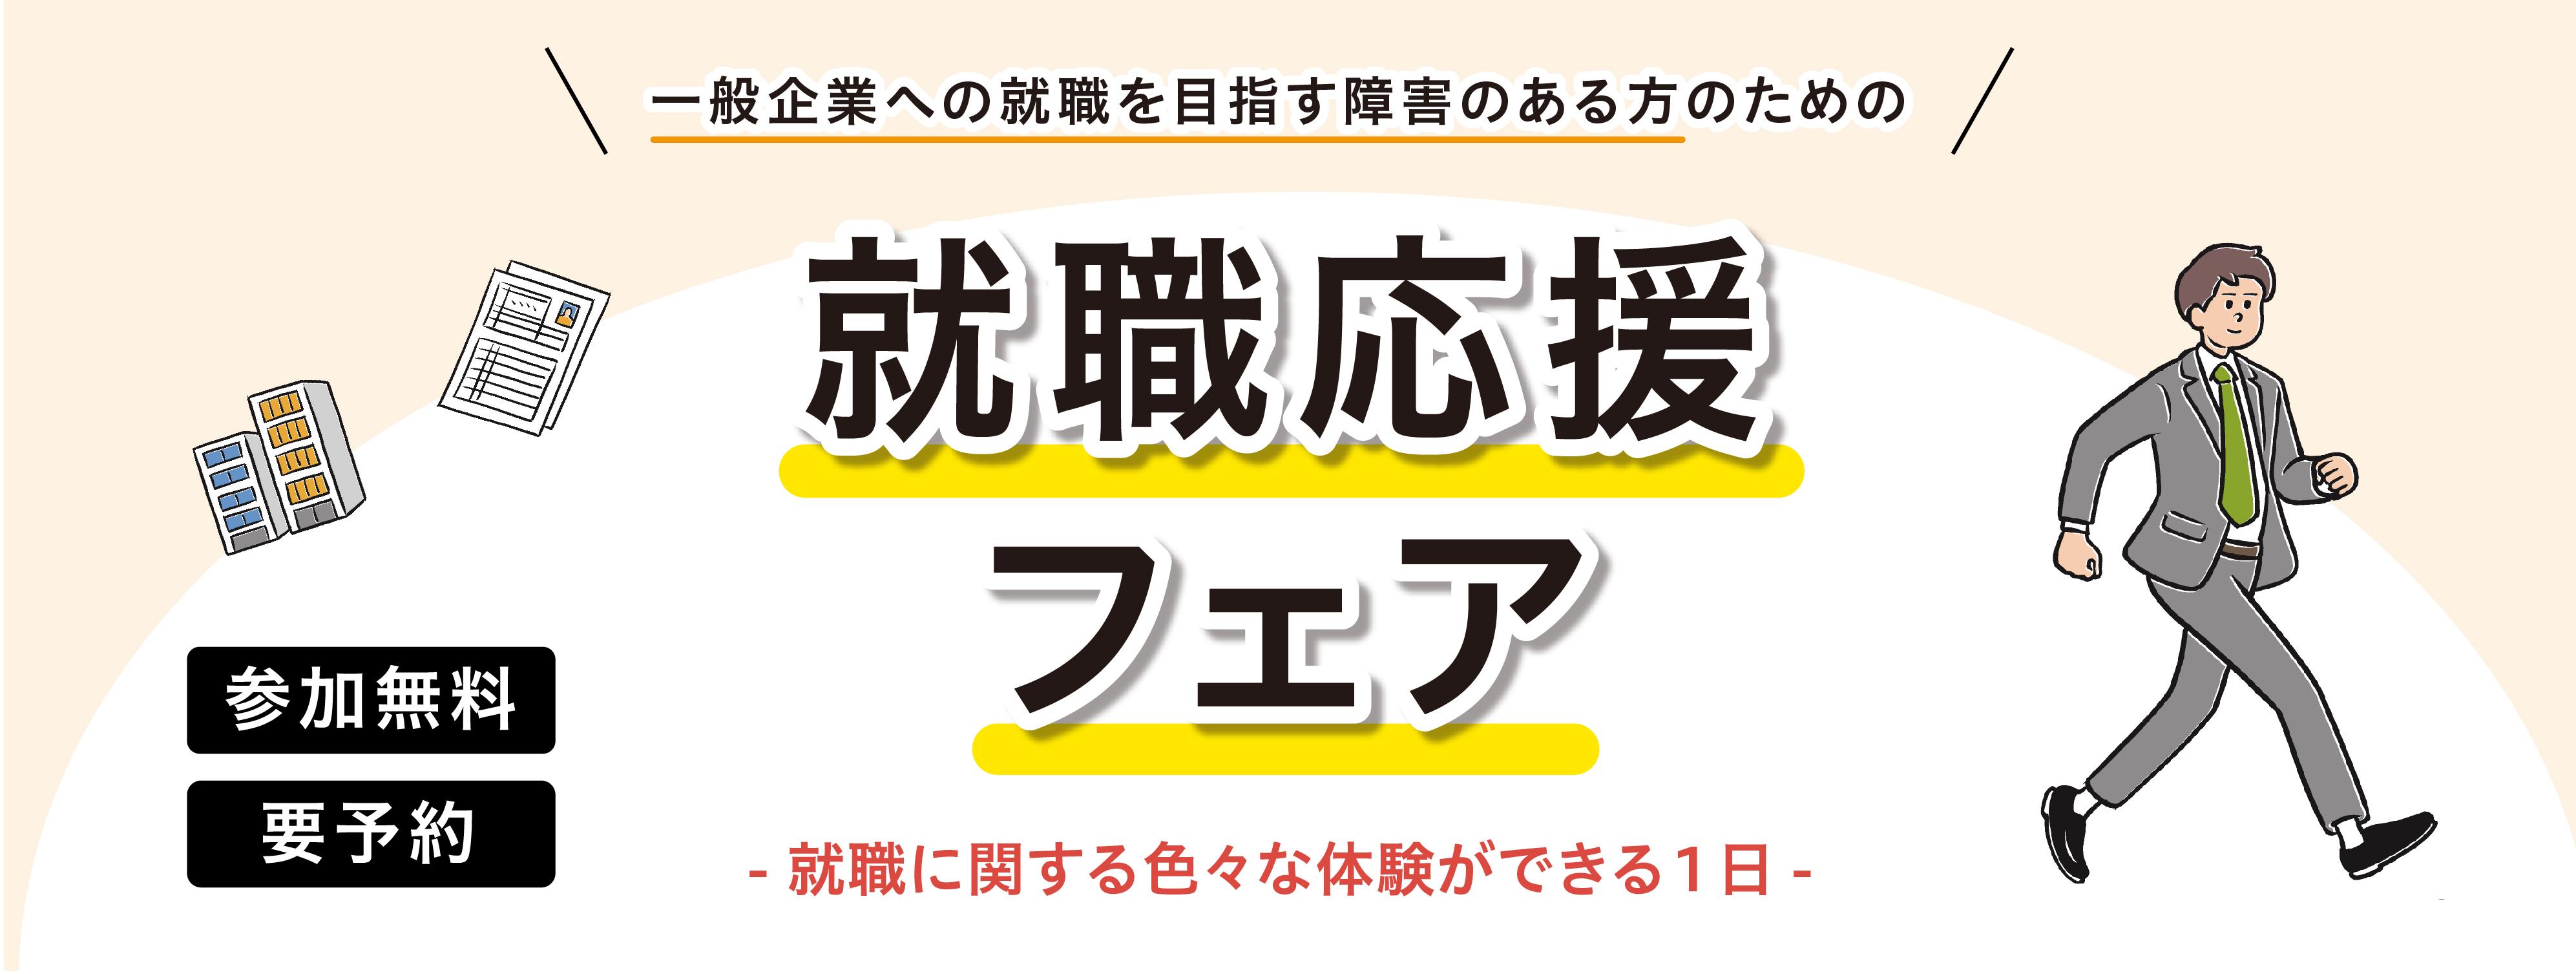 【LITALICOワークス 那須塩原主催】就職応援フェア(3月開催)